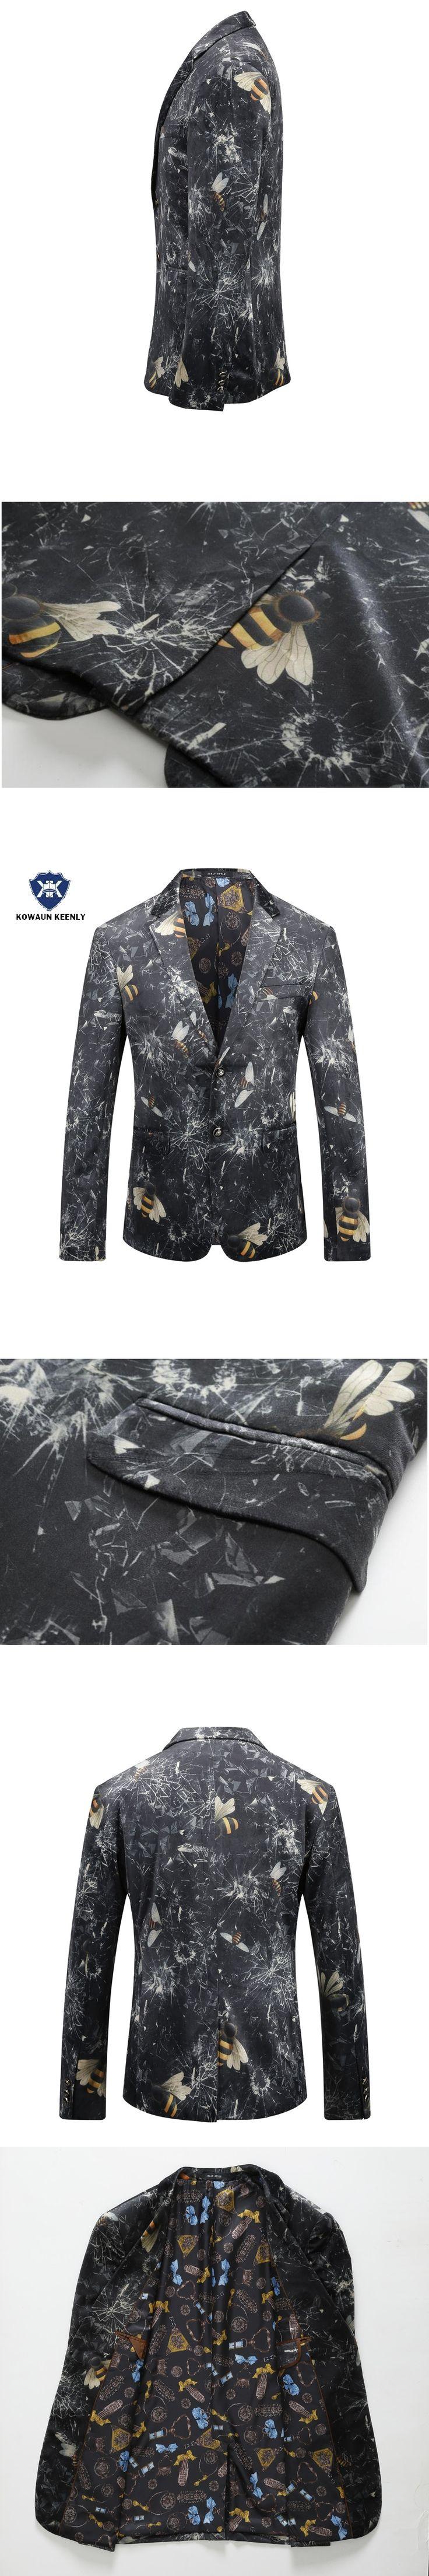 Men Blazer 2017 Autumn Stylish Men Velvet Blazer Slim Fit Casual Suit Jacket Coat Animal Printed Design Party Prom Floral Blazer